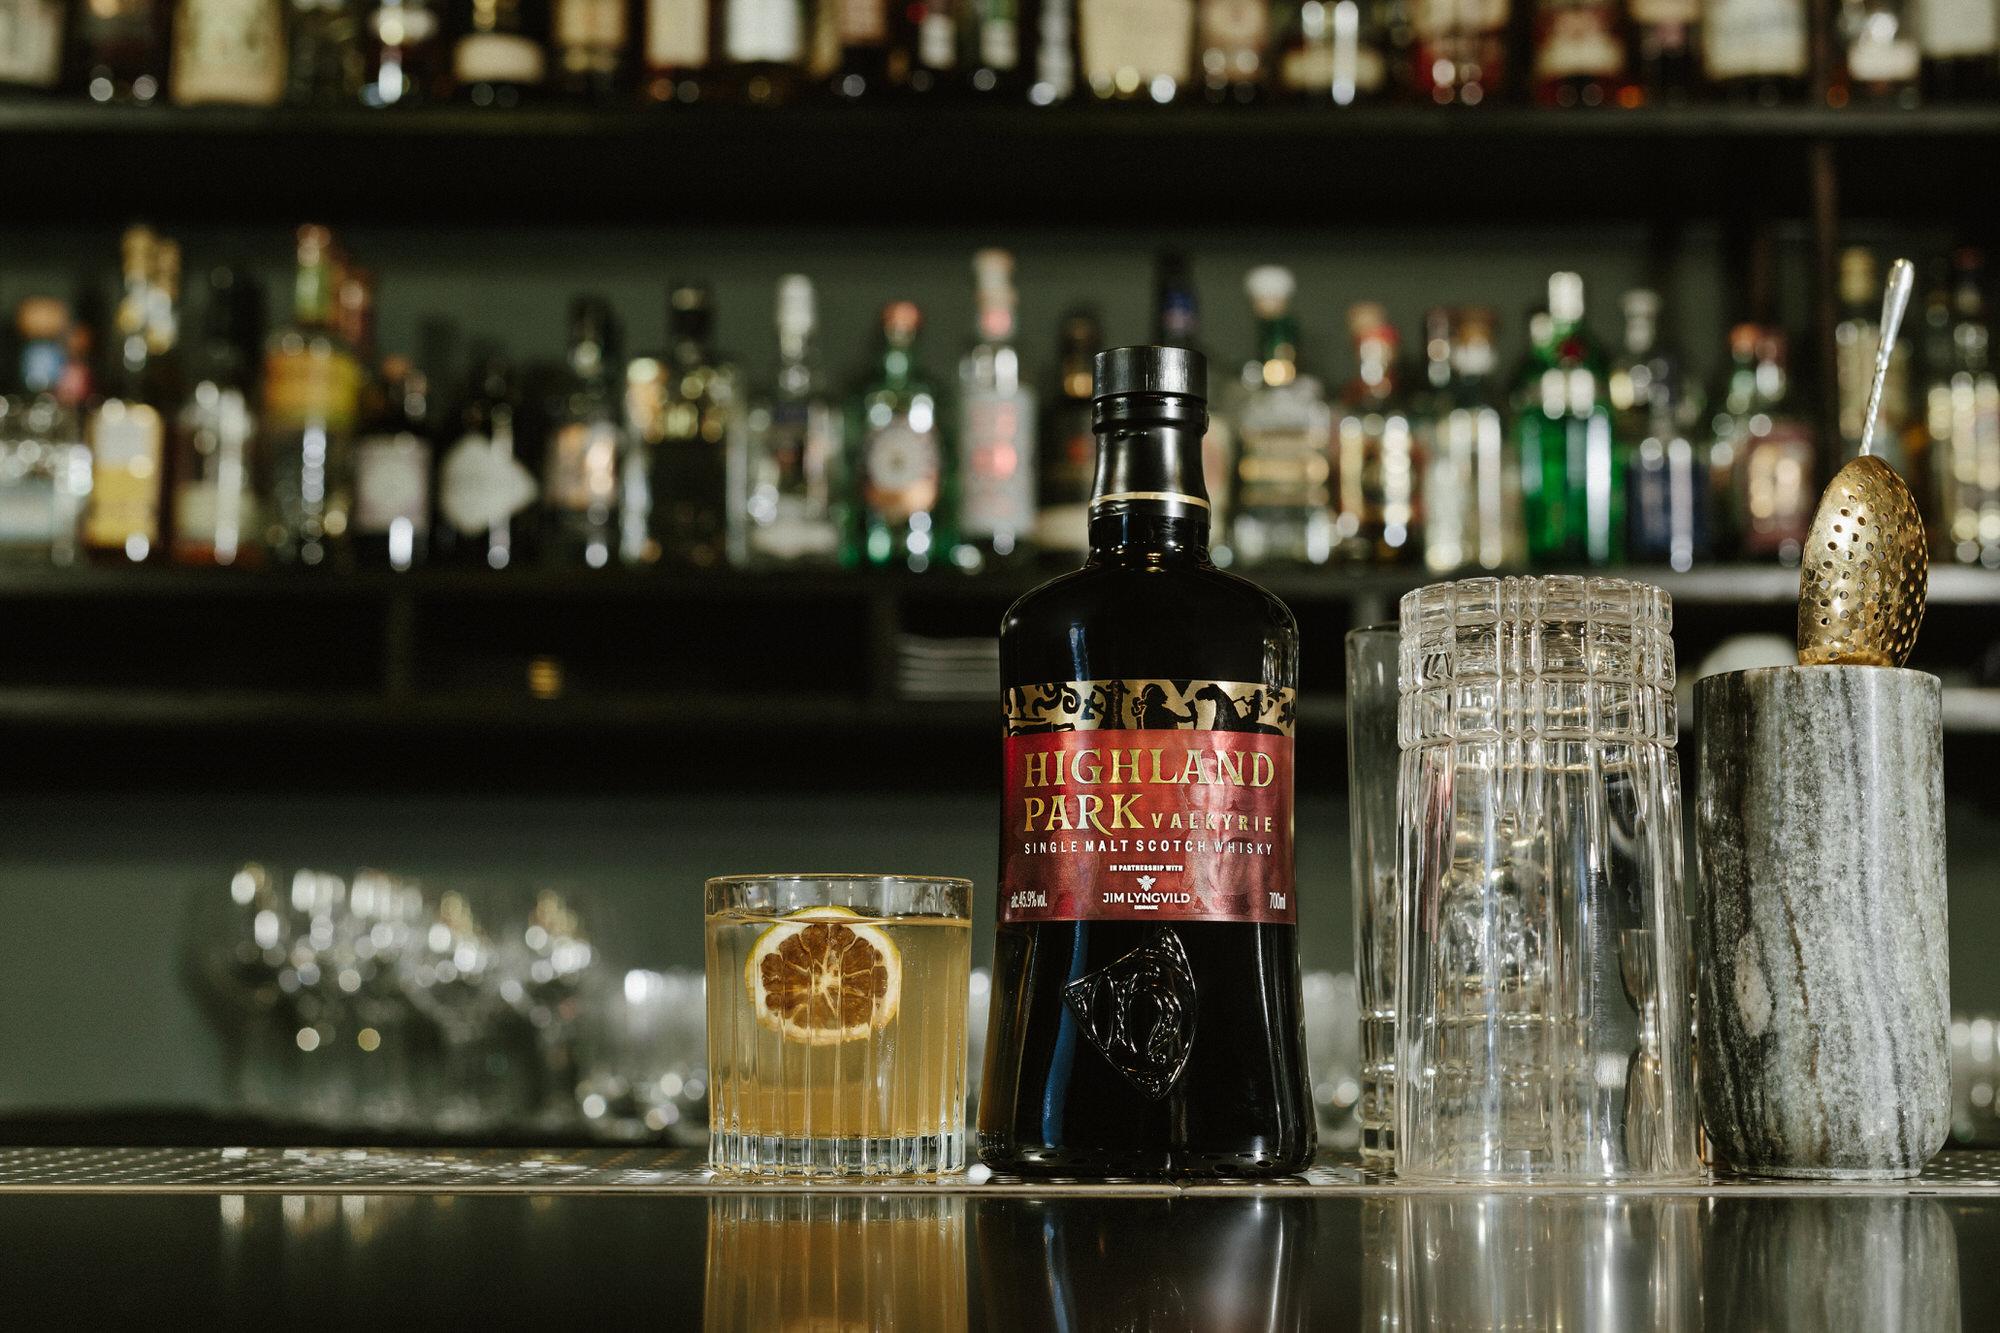 helium-cocktail-bar-highland-park-valkyrie-1.jpg